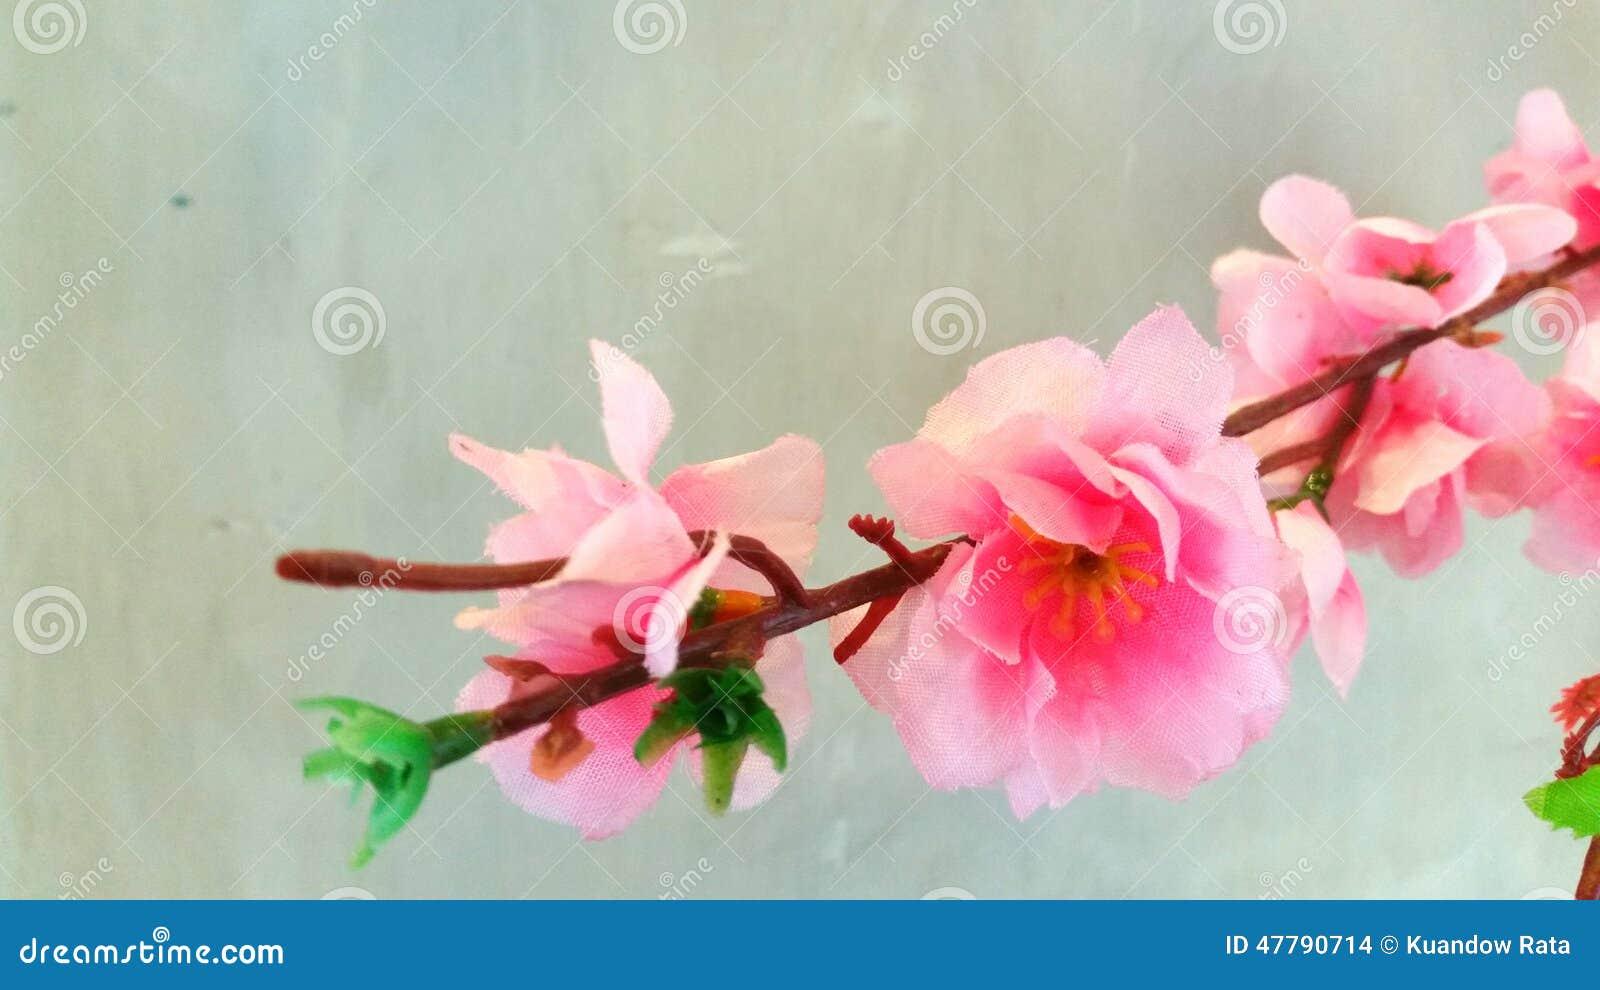 Cherry blossom choice cuts